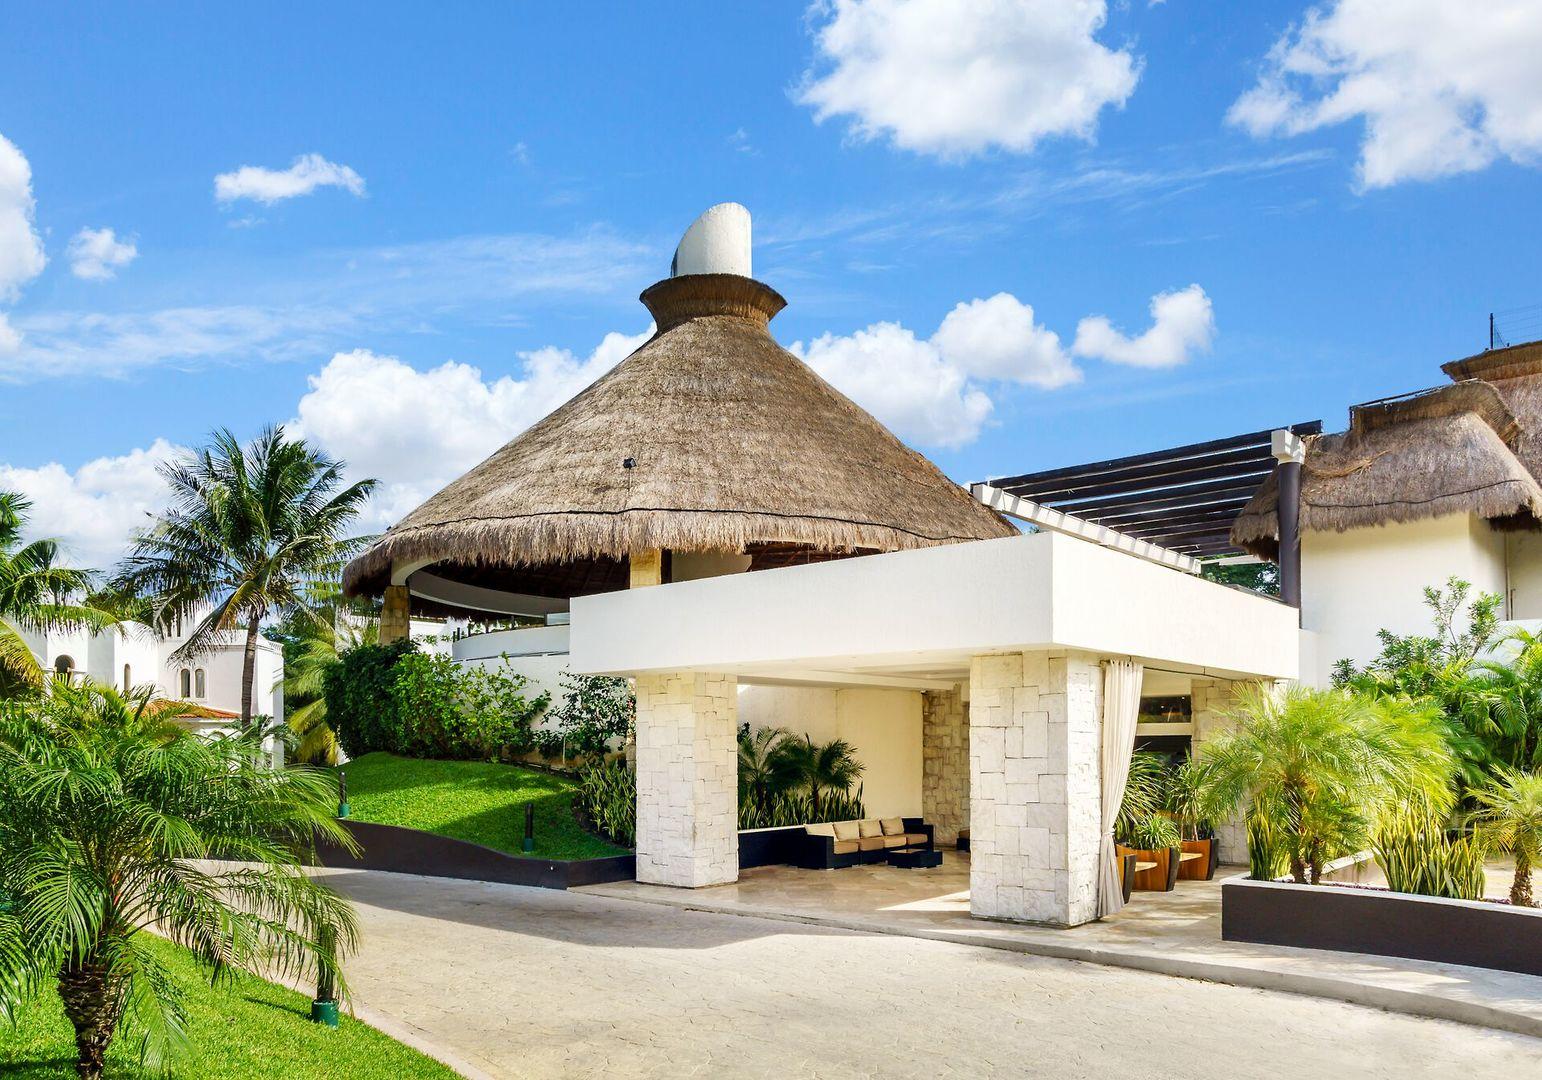 Hotel The Reef Playacar